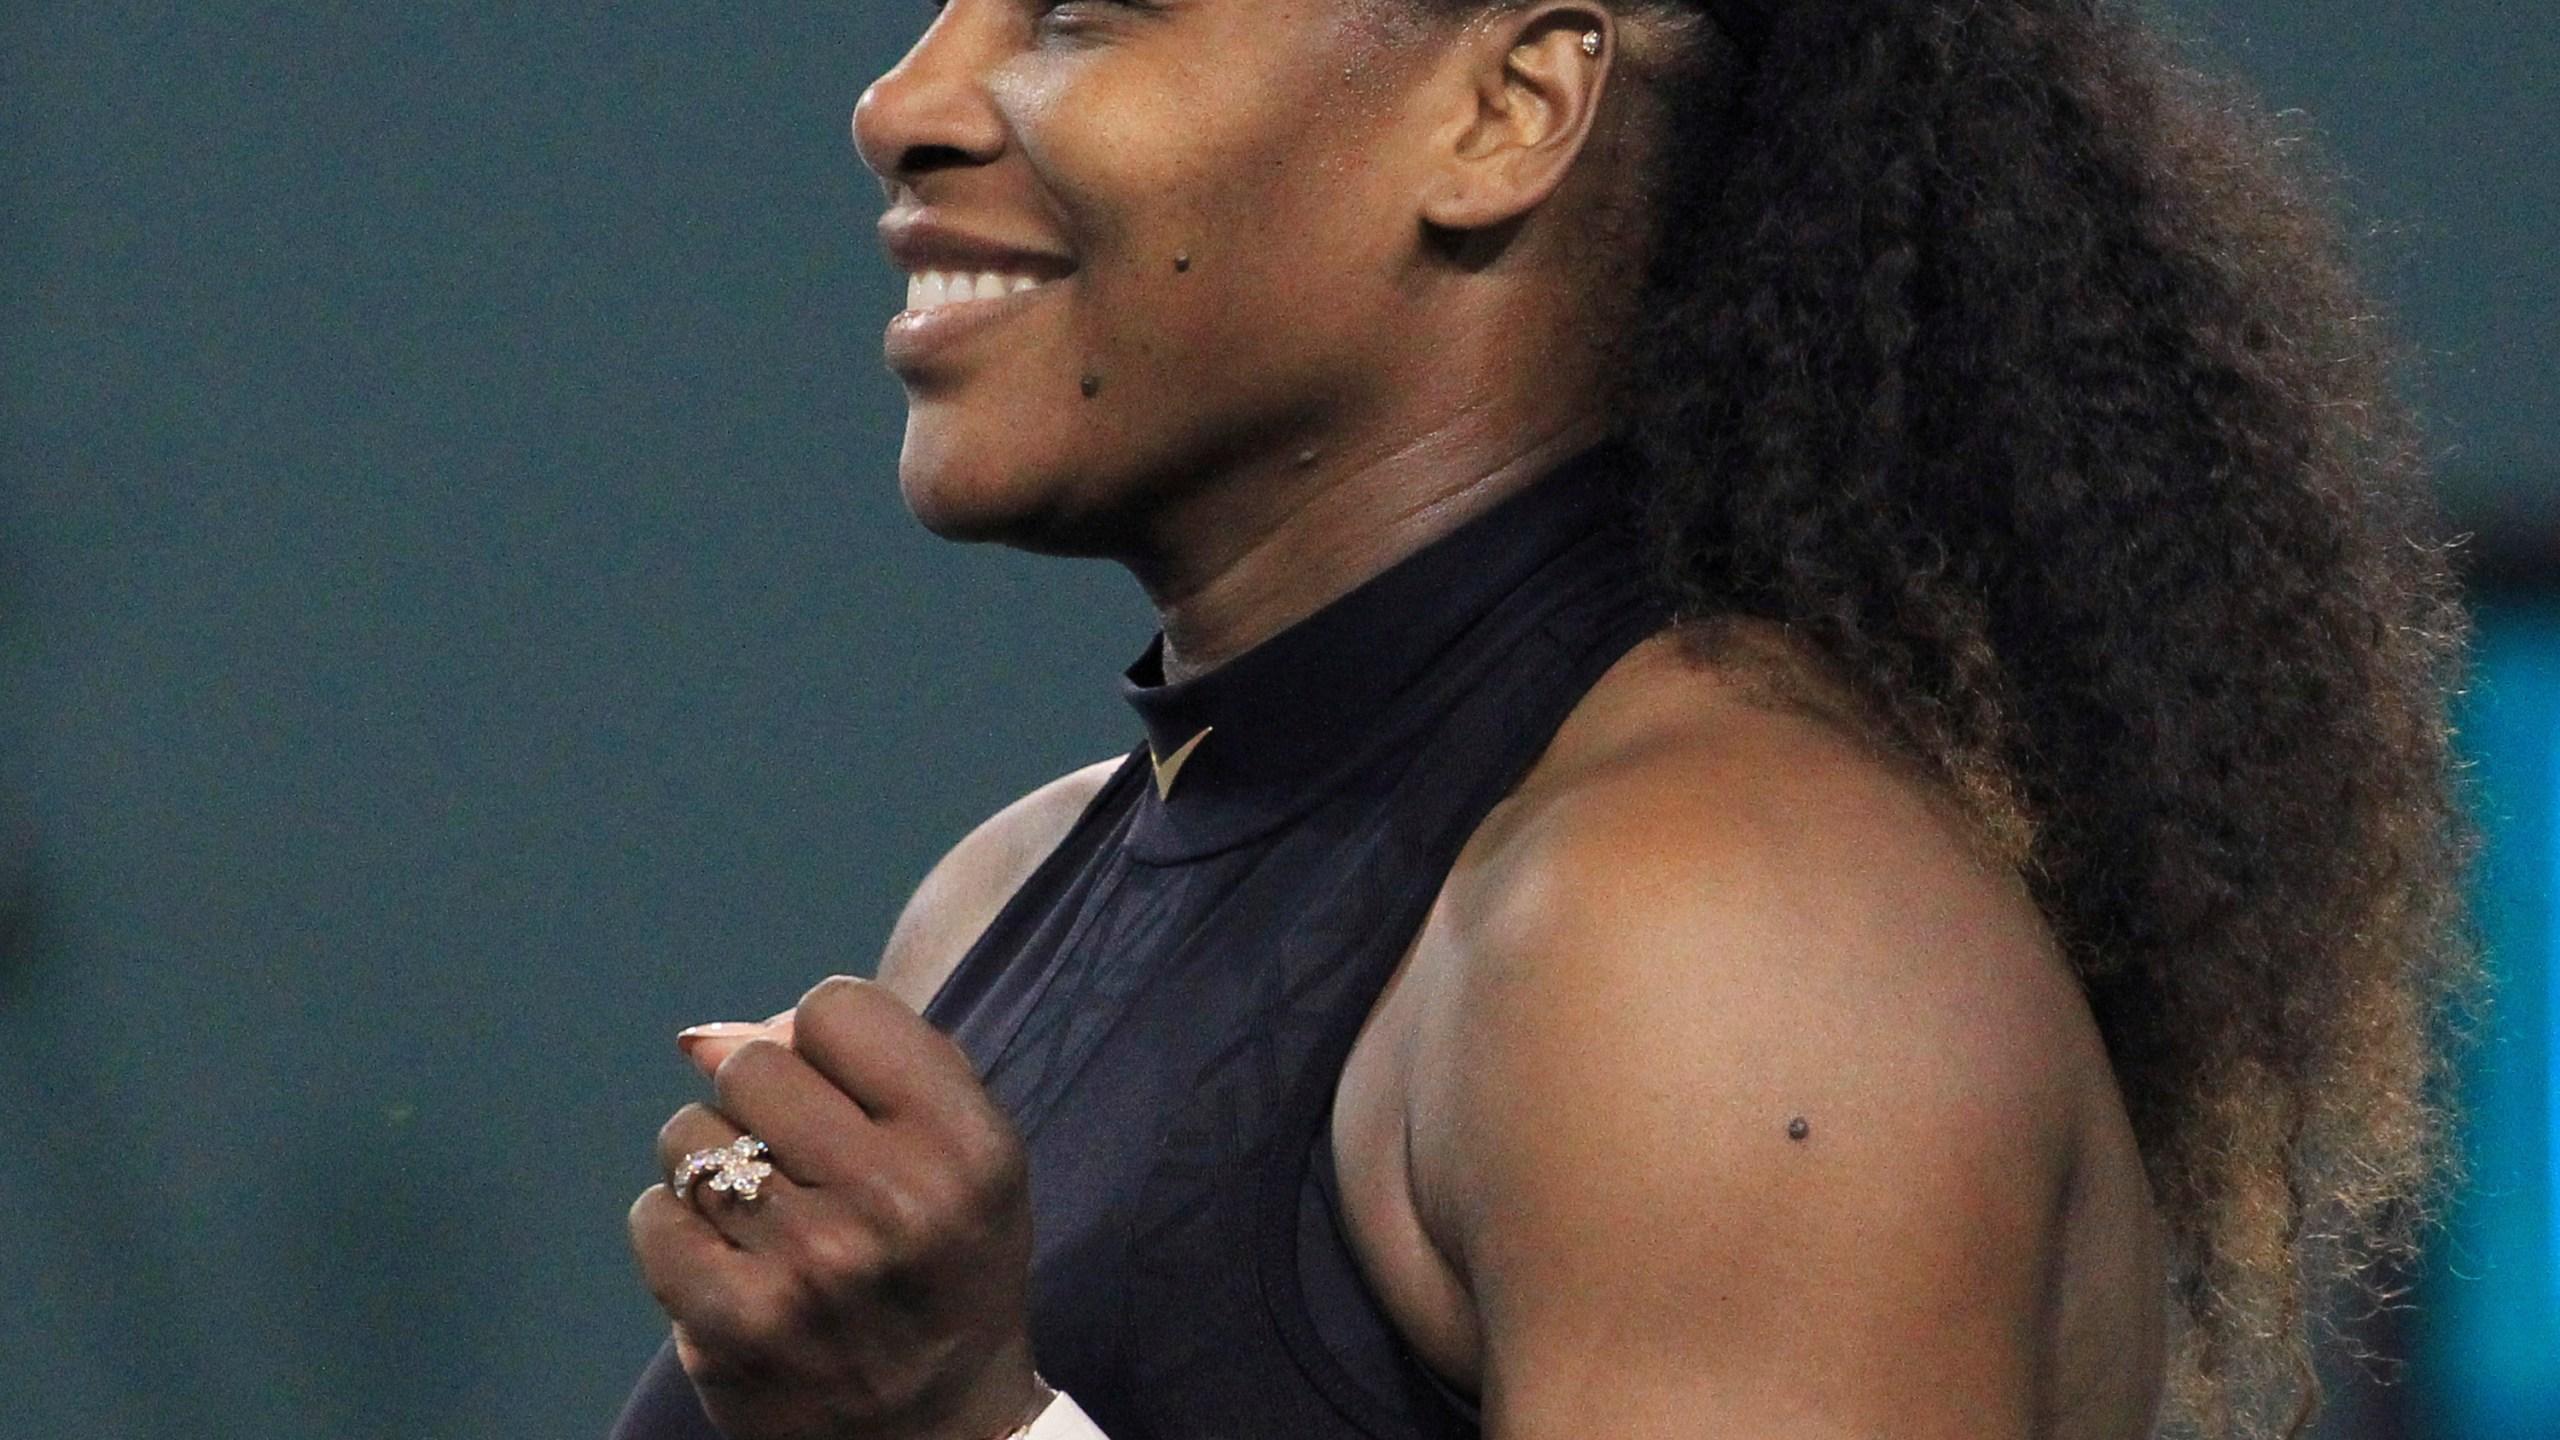 Indian_Wells_Serena_Williams_Tennis_49079-159532.jpg62678461